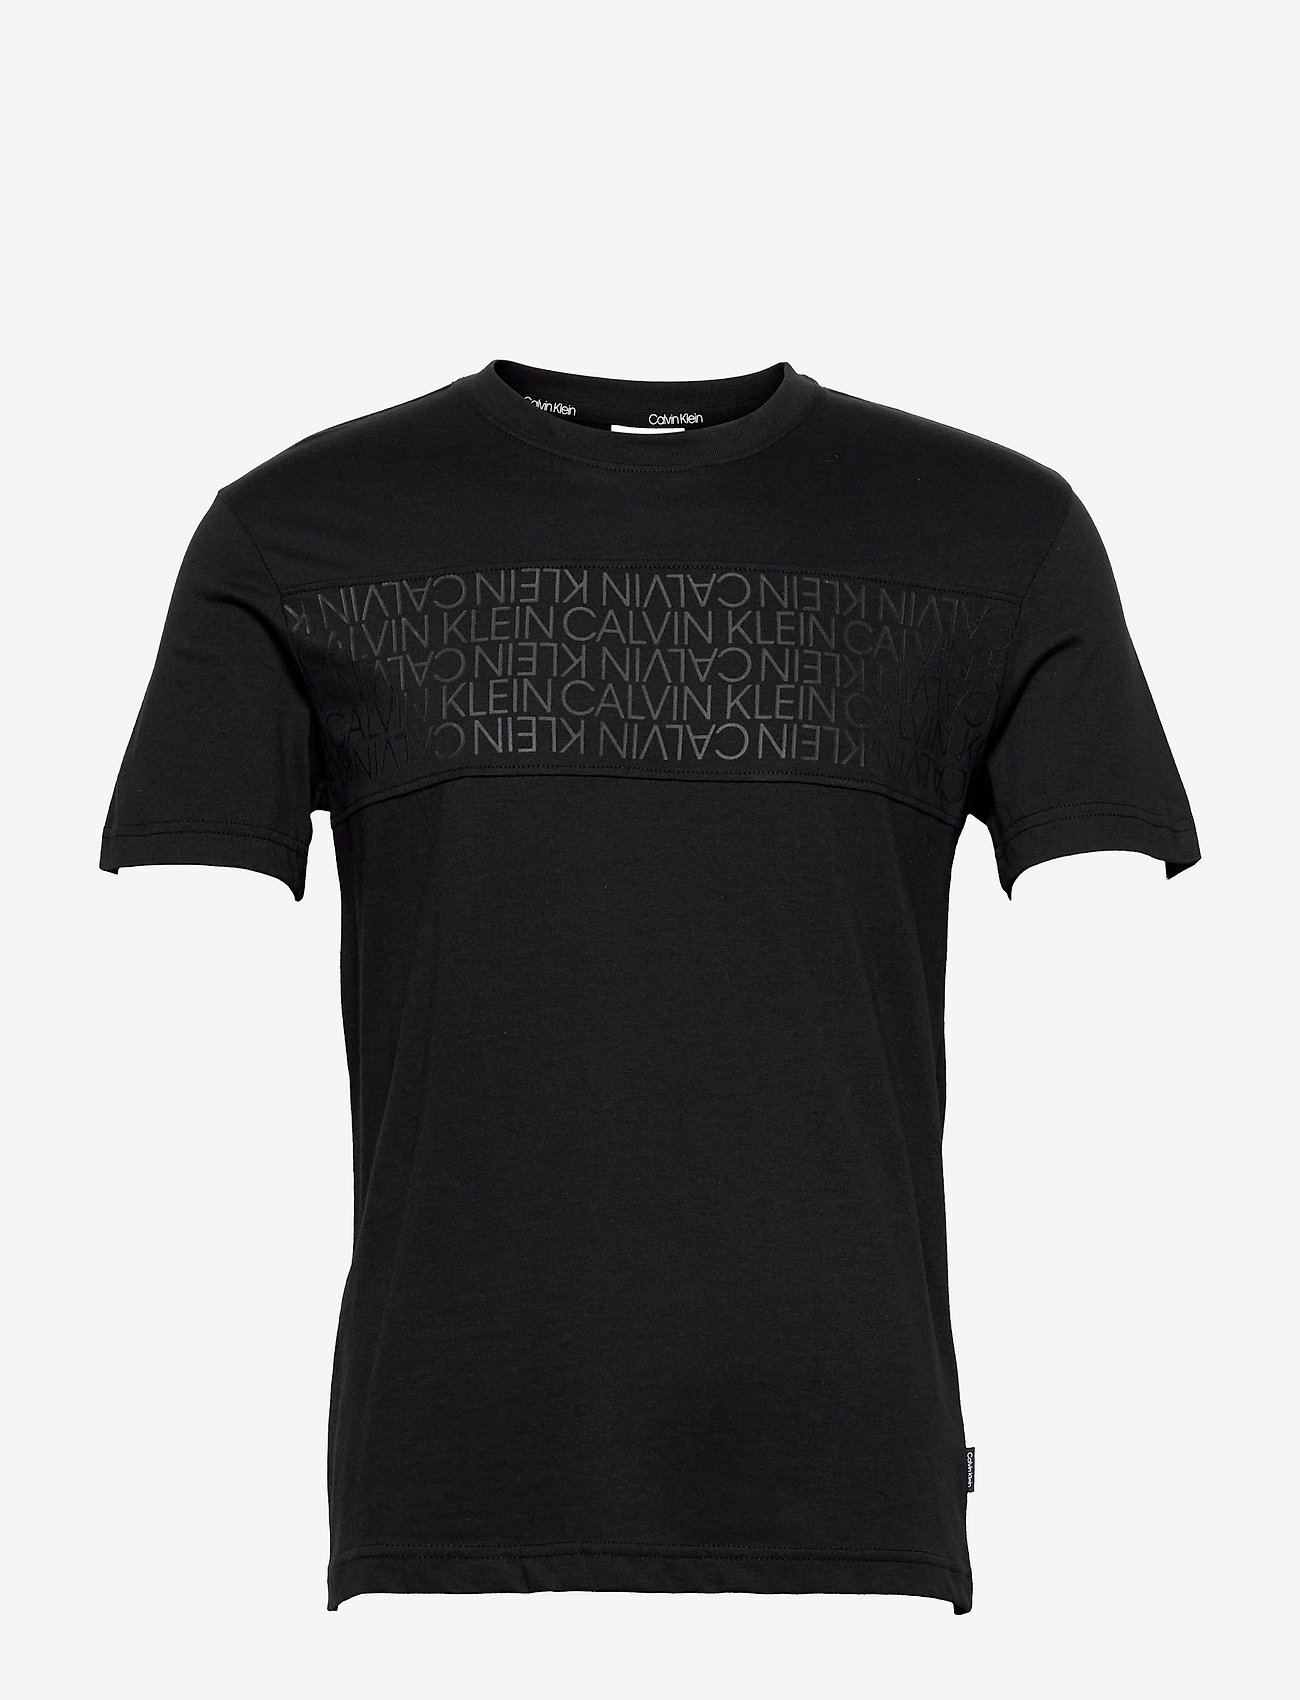 Calvin Klein - LOGO LINES T-SHIRT - ck black - 0